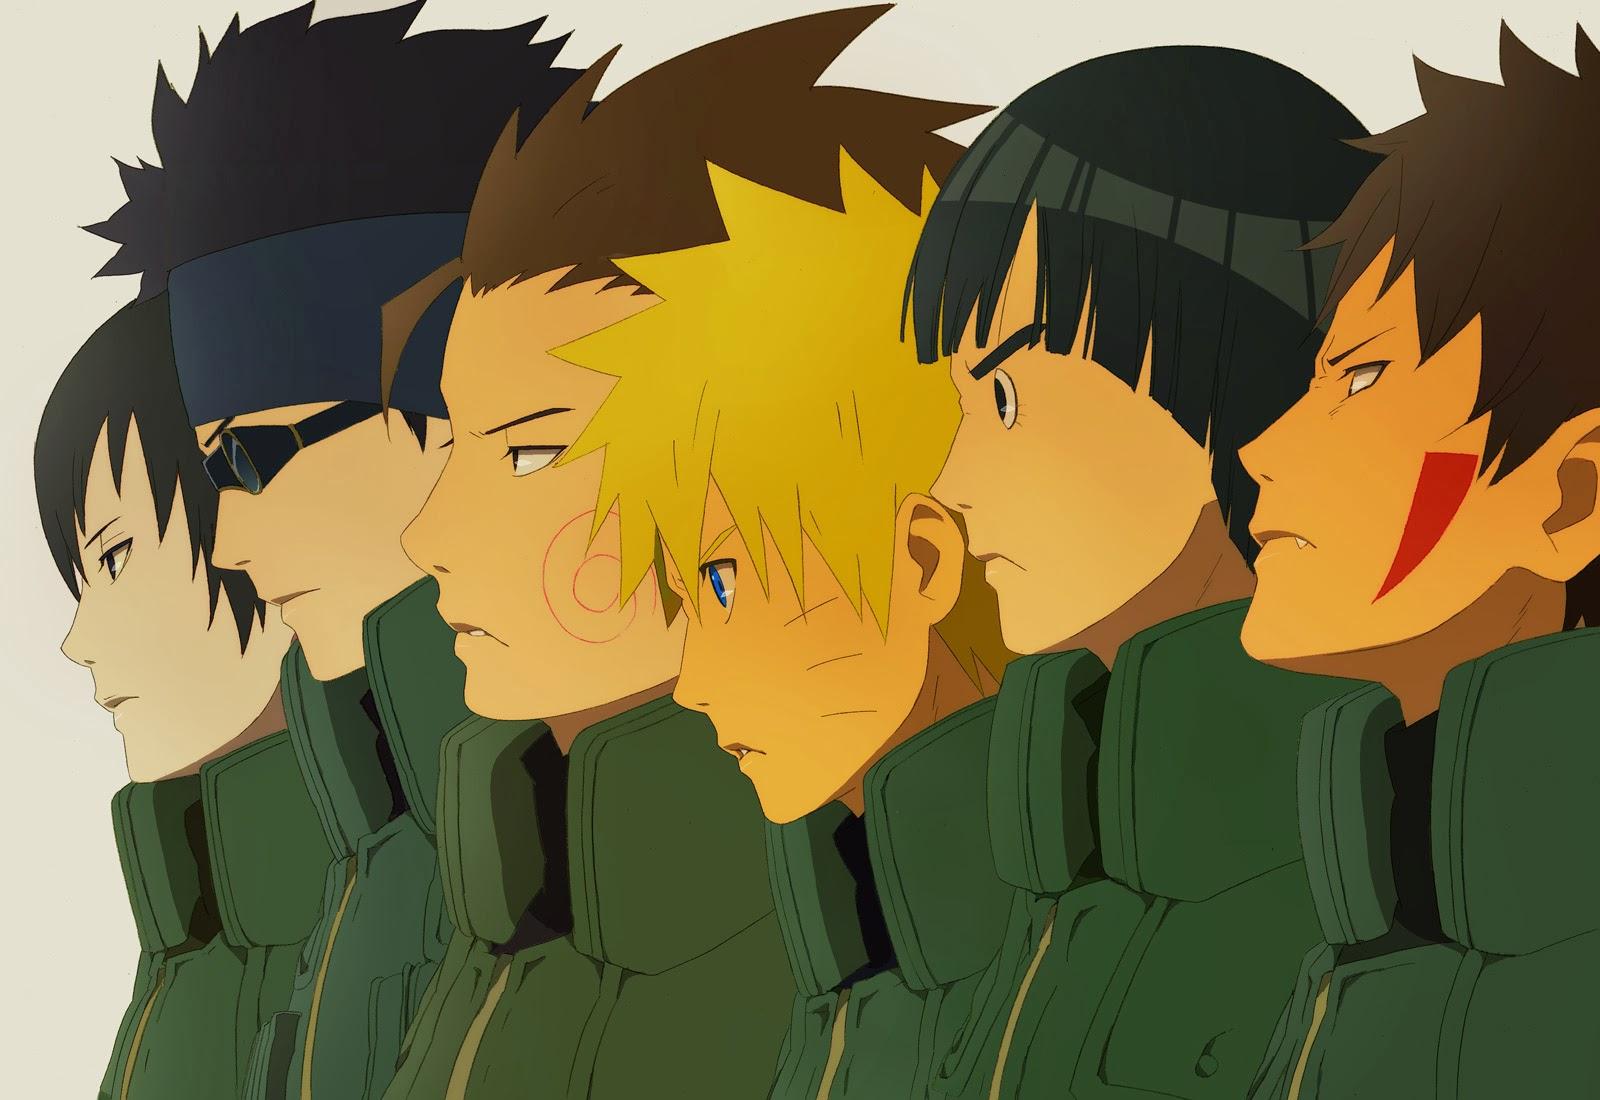 Download Kumpulan Gambar Sketsa Naruto Kartun